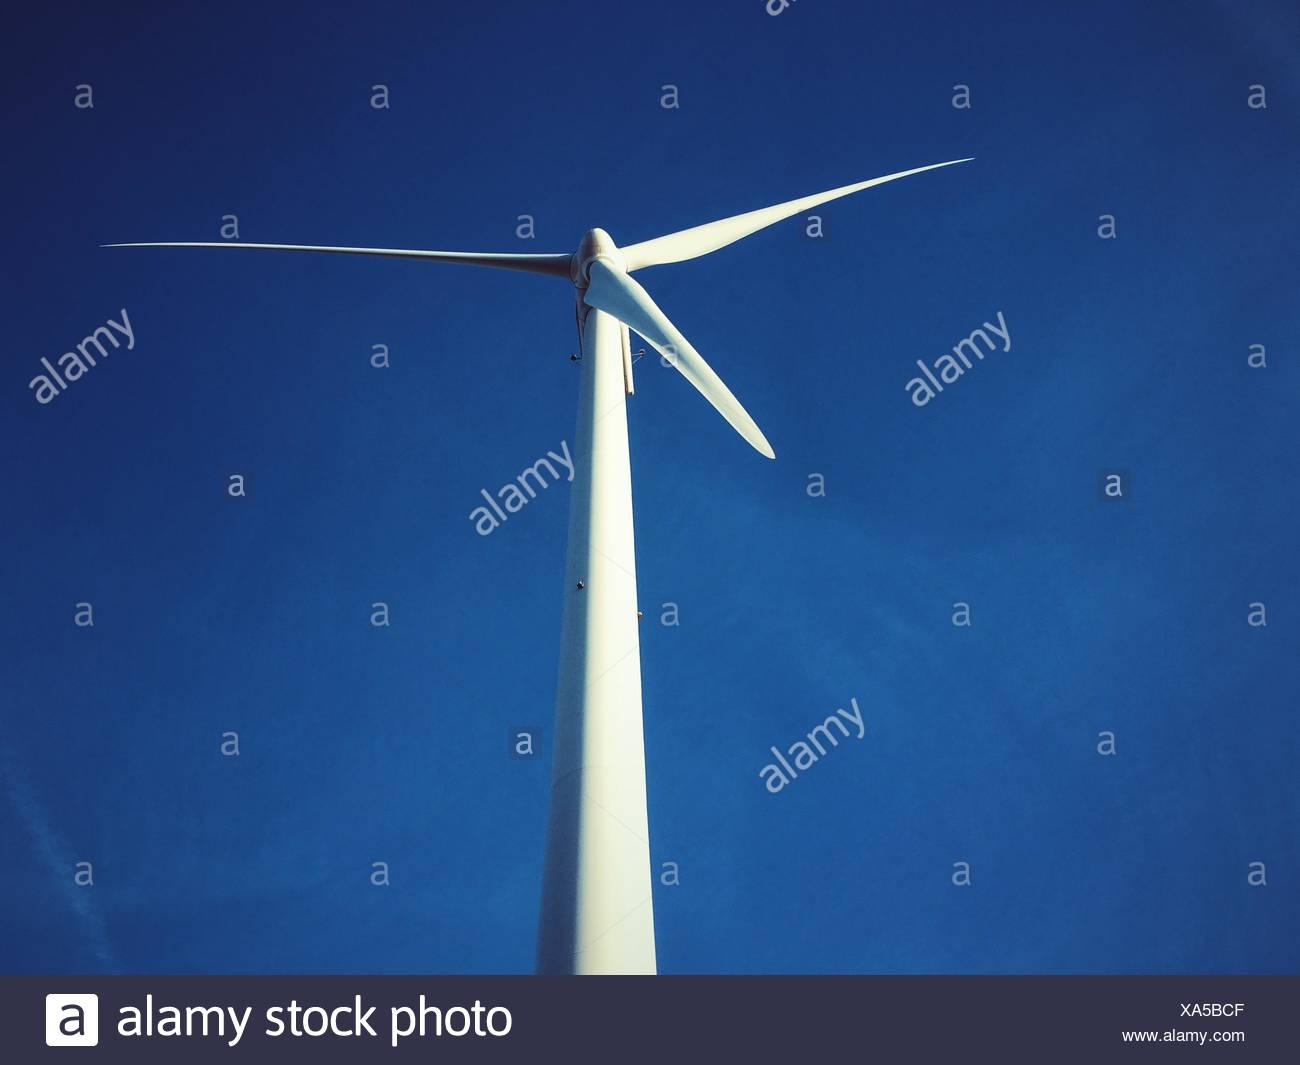 Low Angle View of Wind Turbine contre le ciel bleu Photo Stock